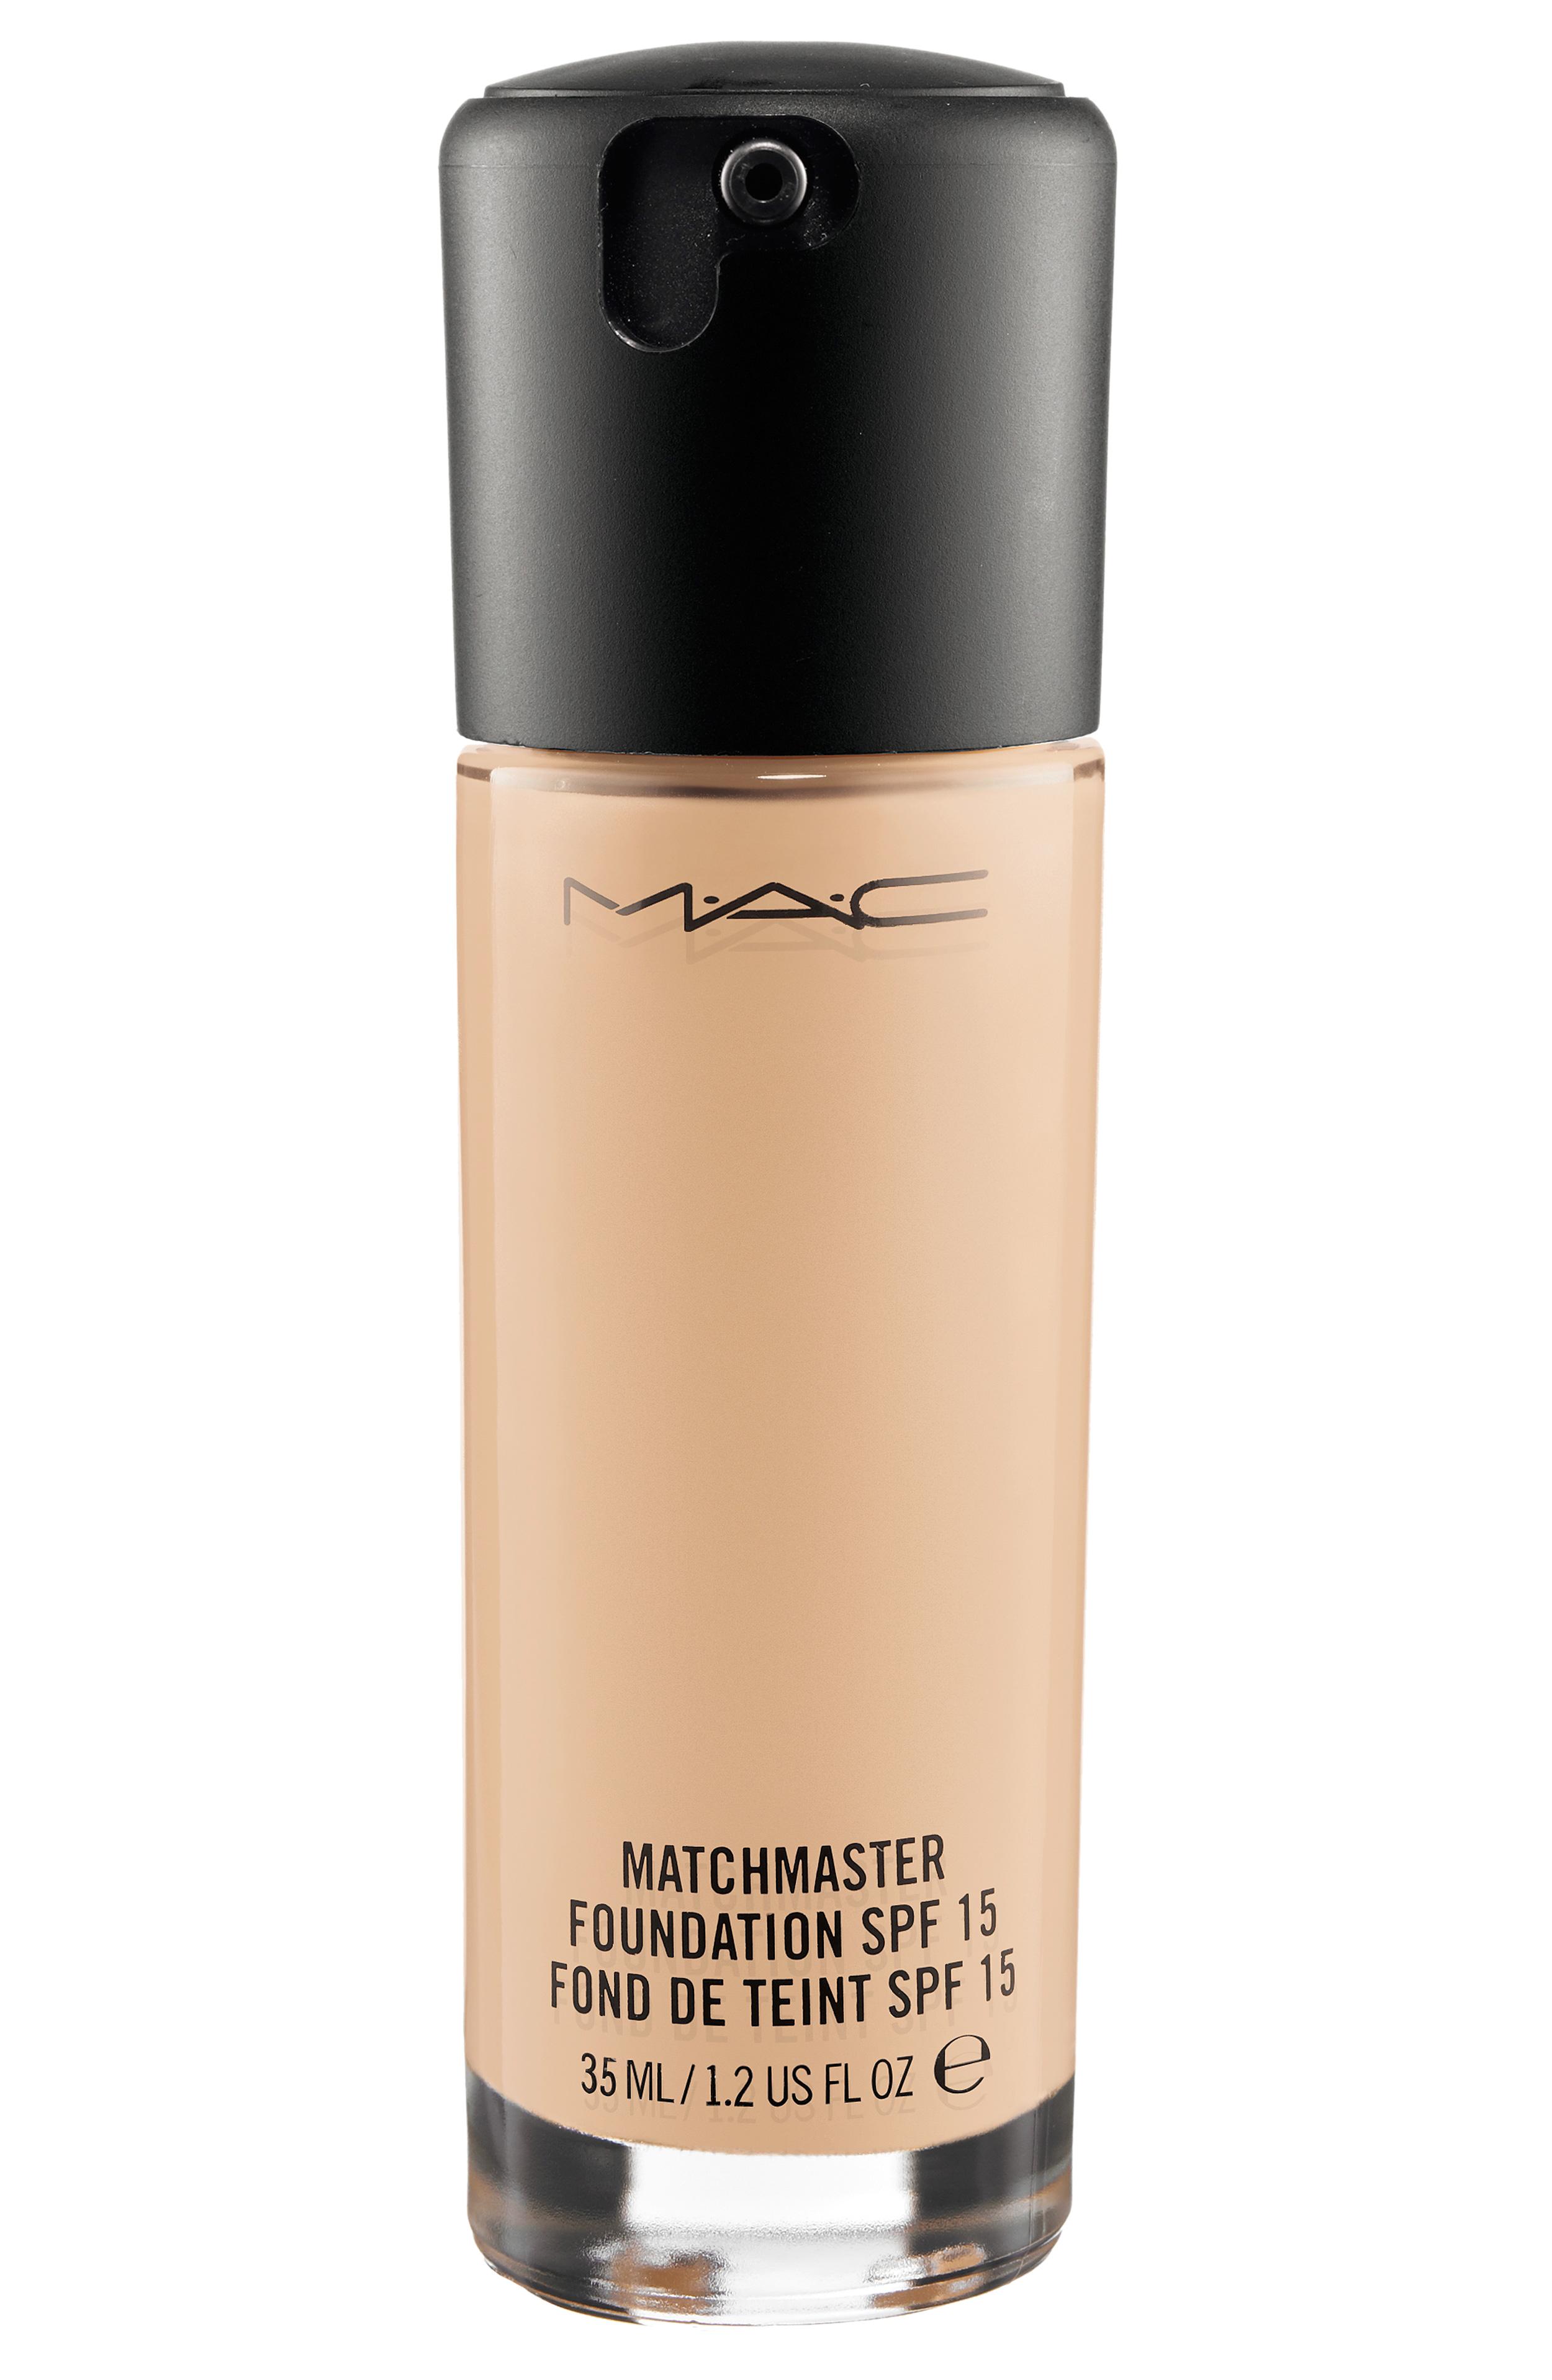 Foundation test 2016: Mac matchmaster